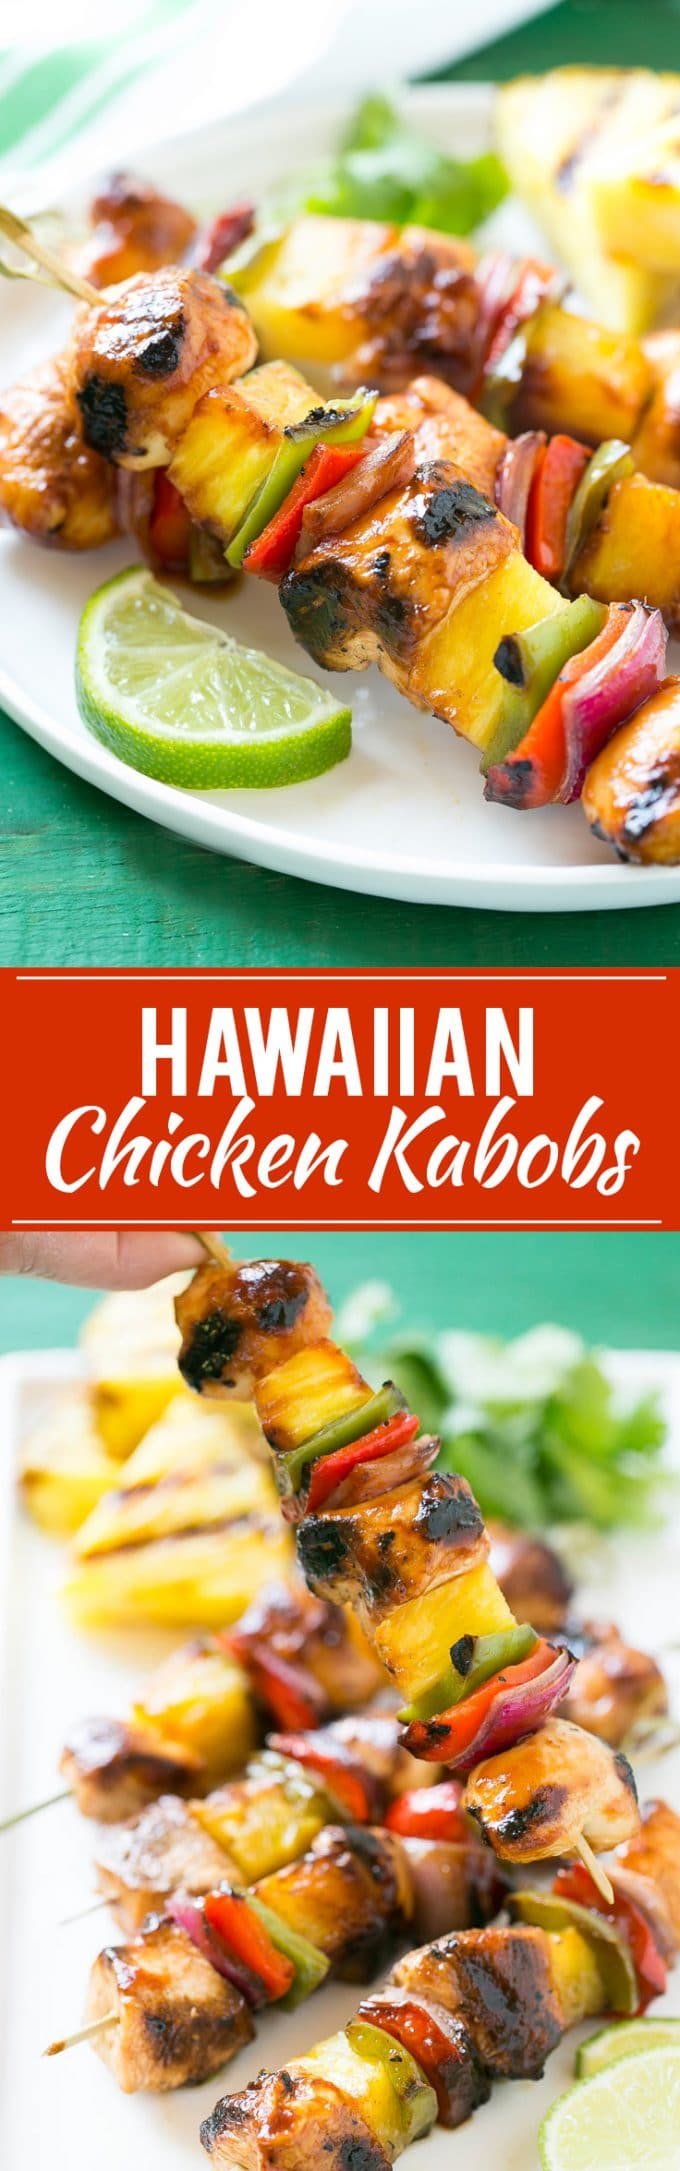 Hawaiian Chicken Kabobs Recipe | Hawaiian Chicken Kabobs | Chicken Pineapple Kabobs #pineapple #chicken #grilling #dinner #dinneratthezoo